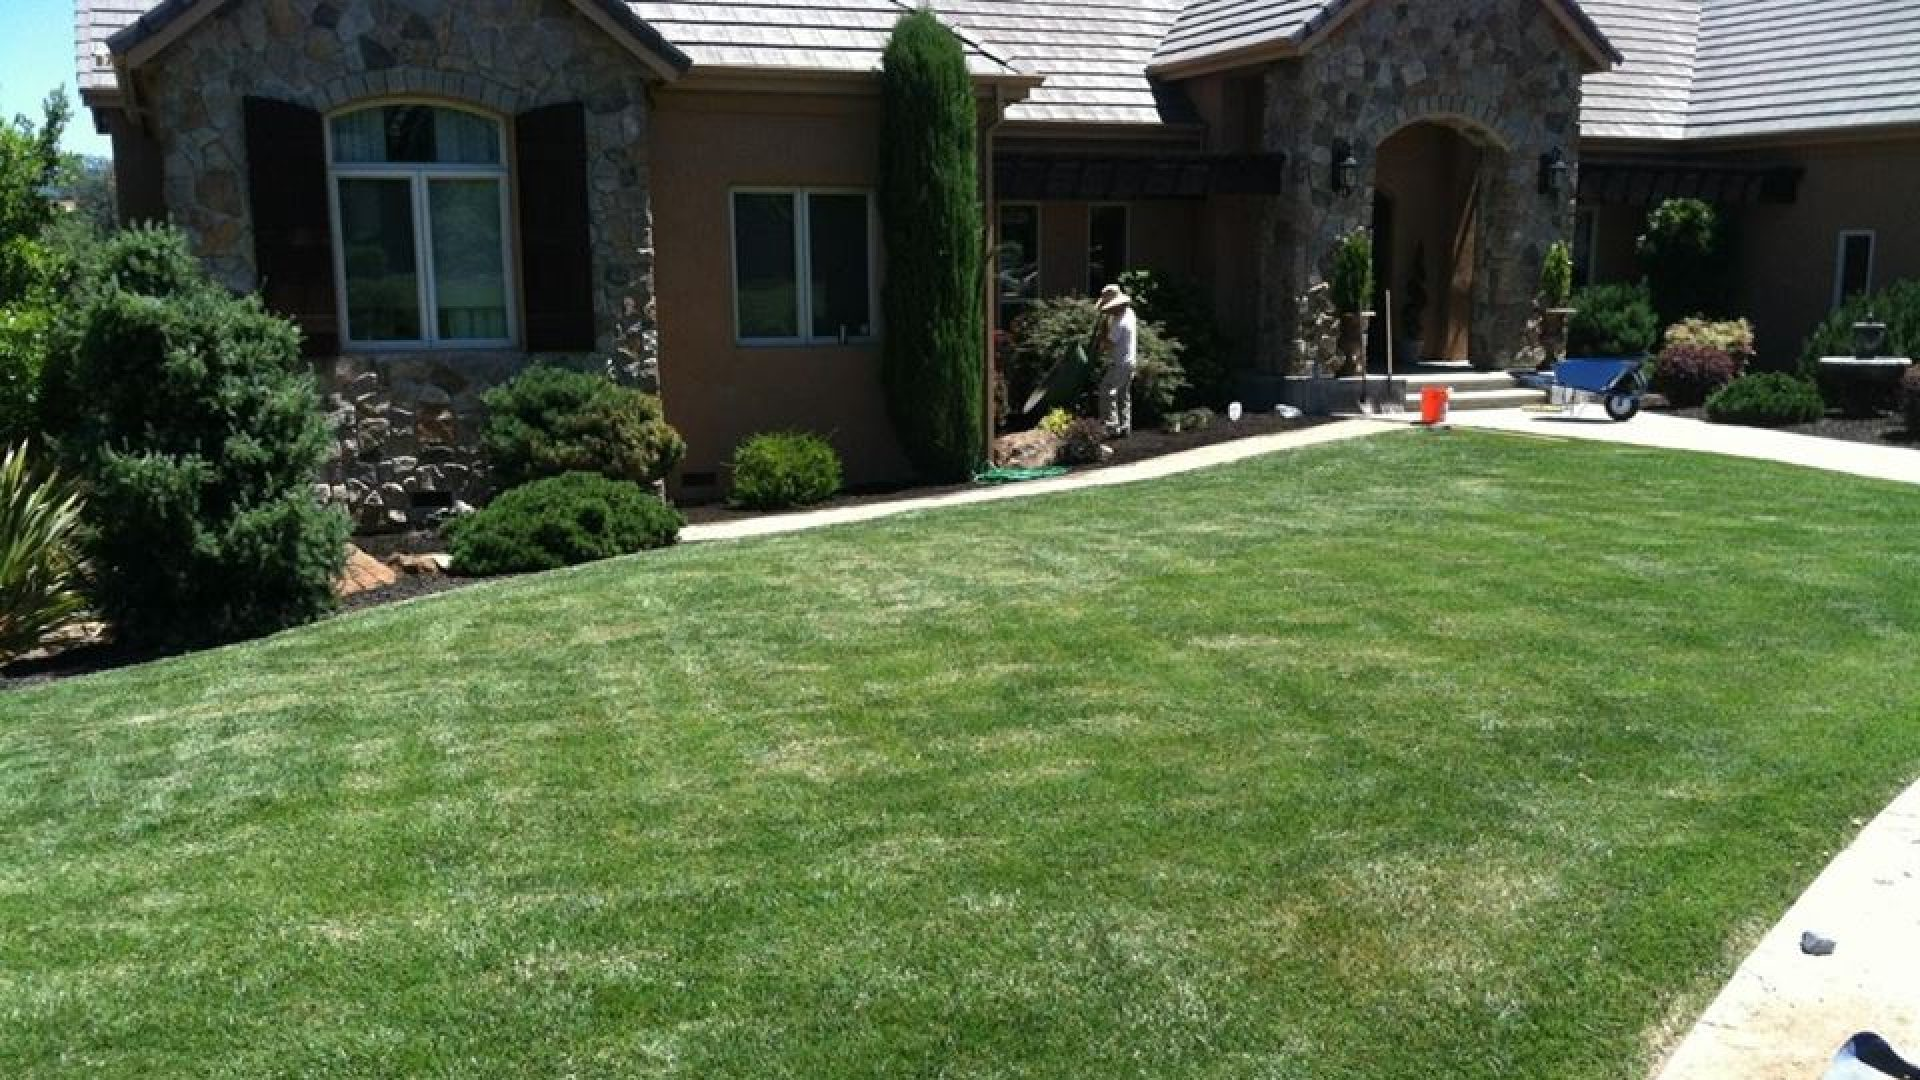 Aaron's Yard Care & Hauling